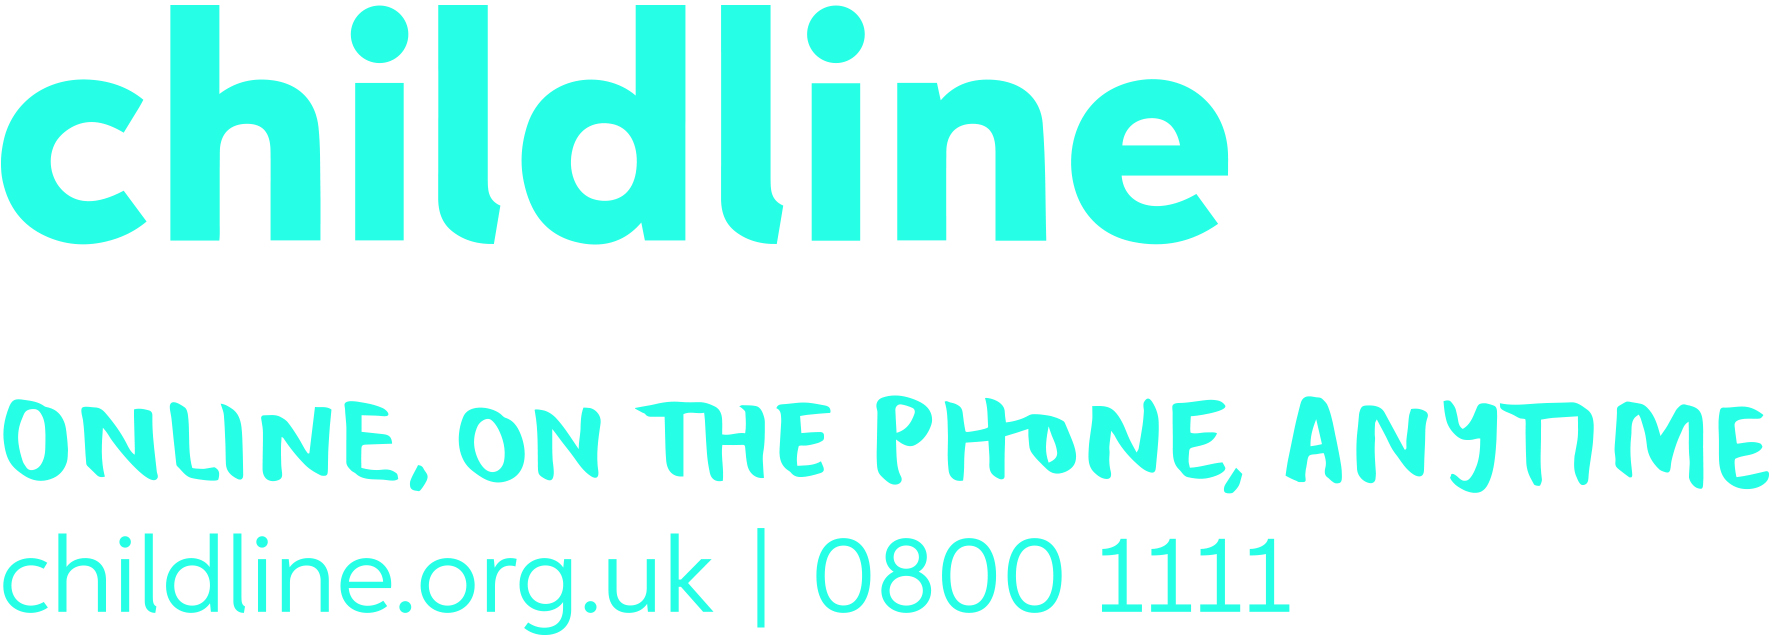 https://www.merseysidesport.com/wp-content/uploads/2018/07/Childline-Primary-Logo_CMYK_Blue.jpg